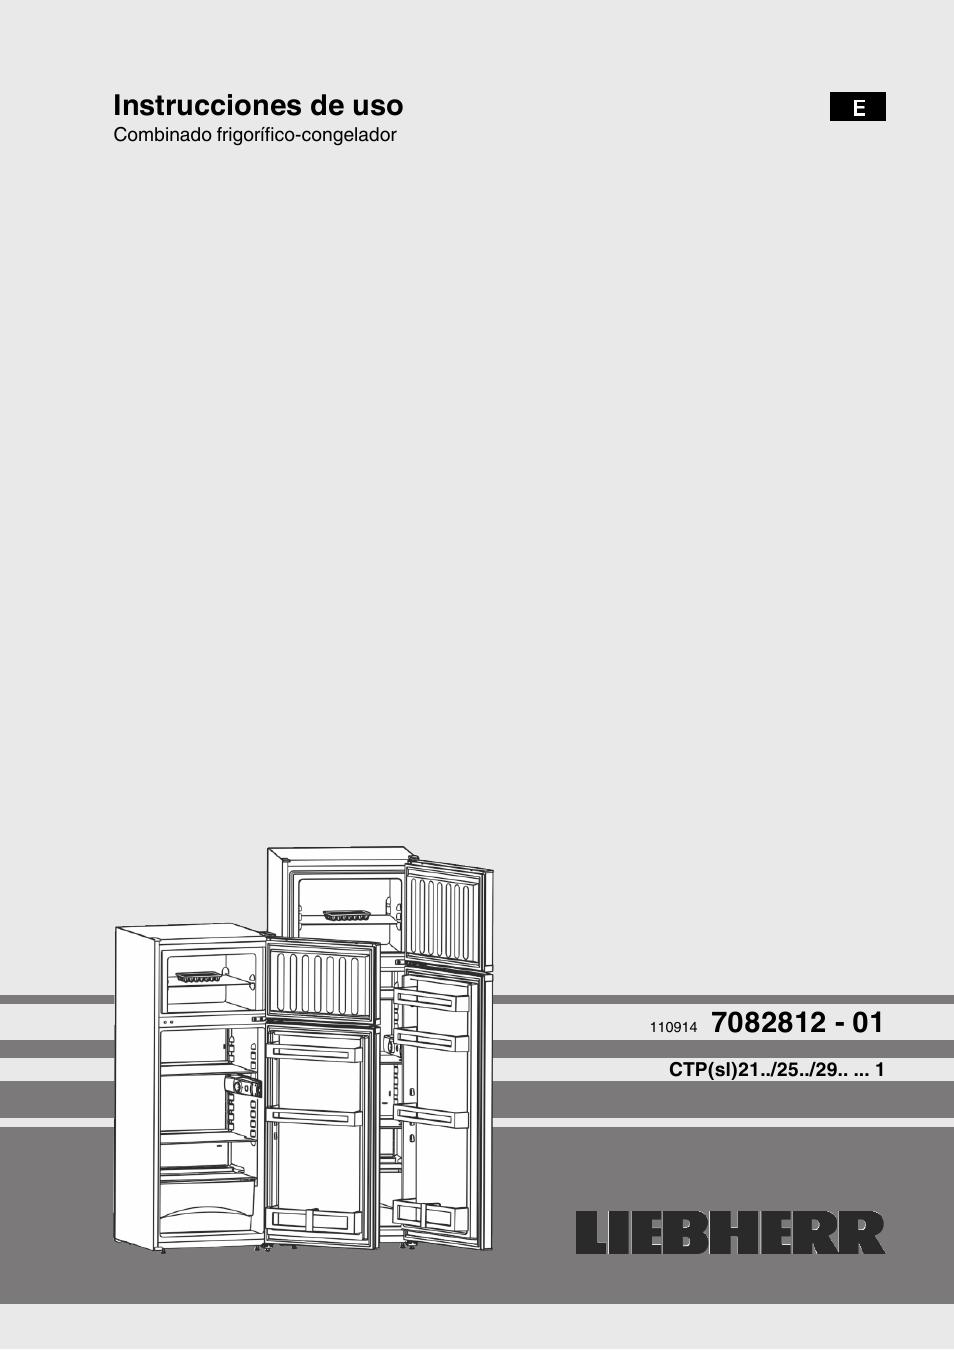 Liebherr CTP 2521 Comfort Manual del usuario | Páginas: 12 | También para:  CTP 2921 Comfort, CTPsl 2921 Comfort, CTP 2121 Comfort, CTPsl 2521 Comfort